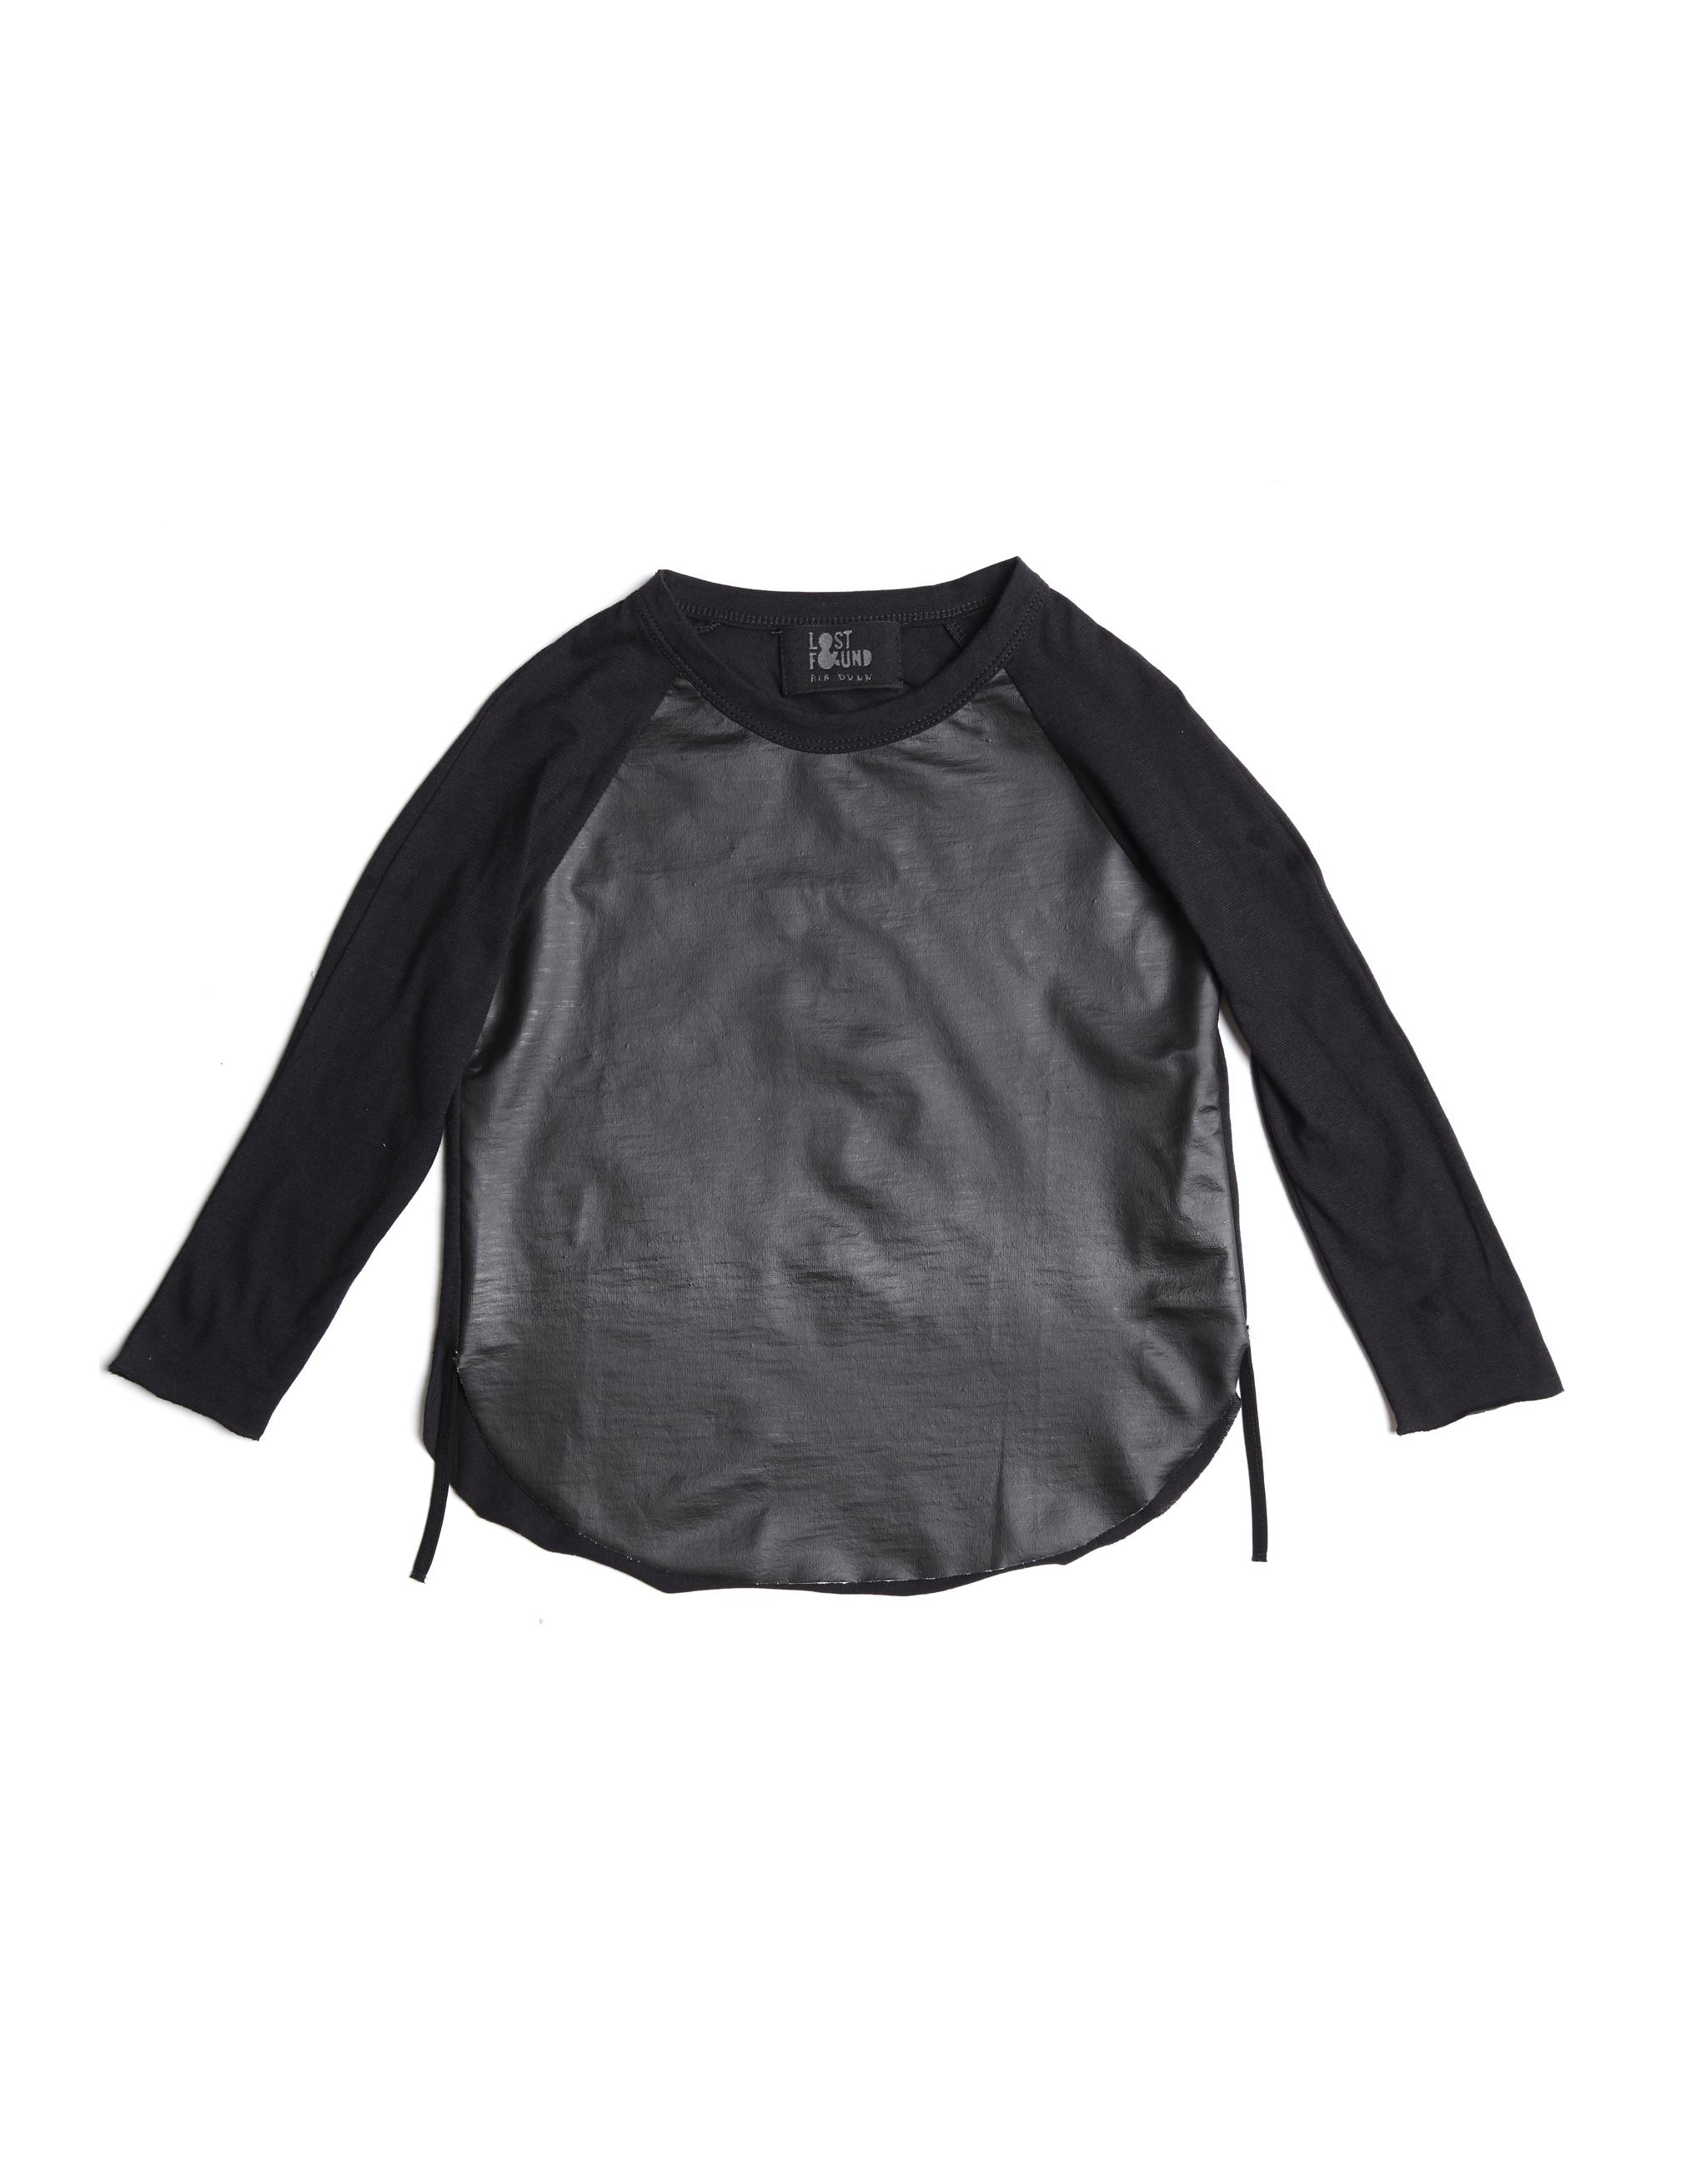 Lost&Found kids Black Cotton Long Sleeve T-Shirt